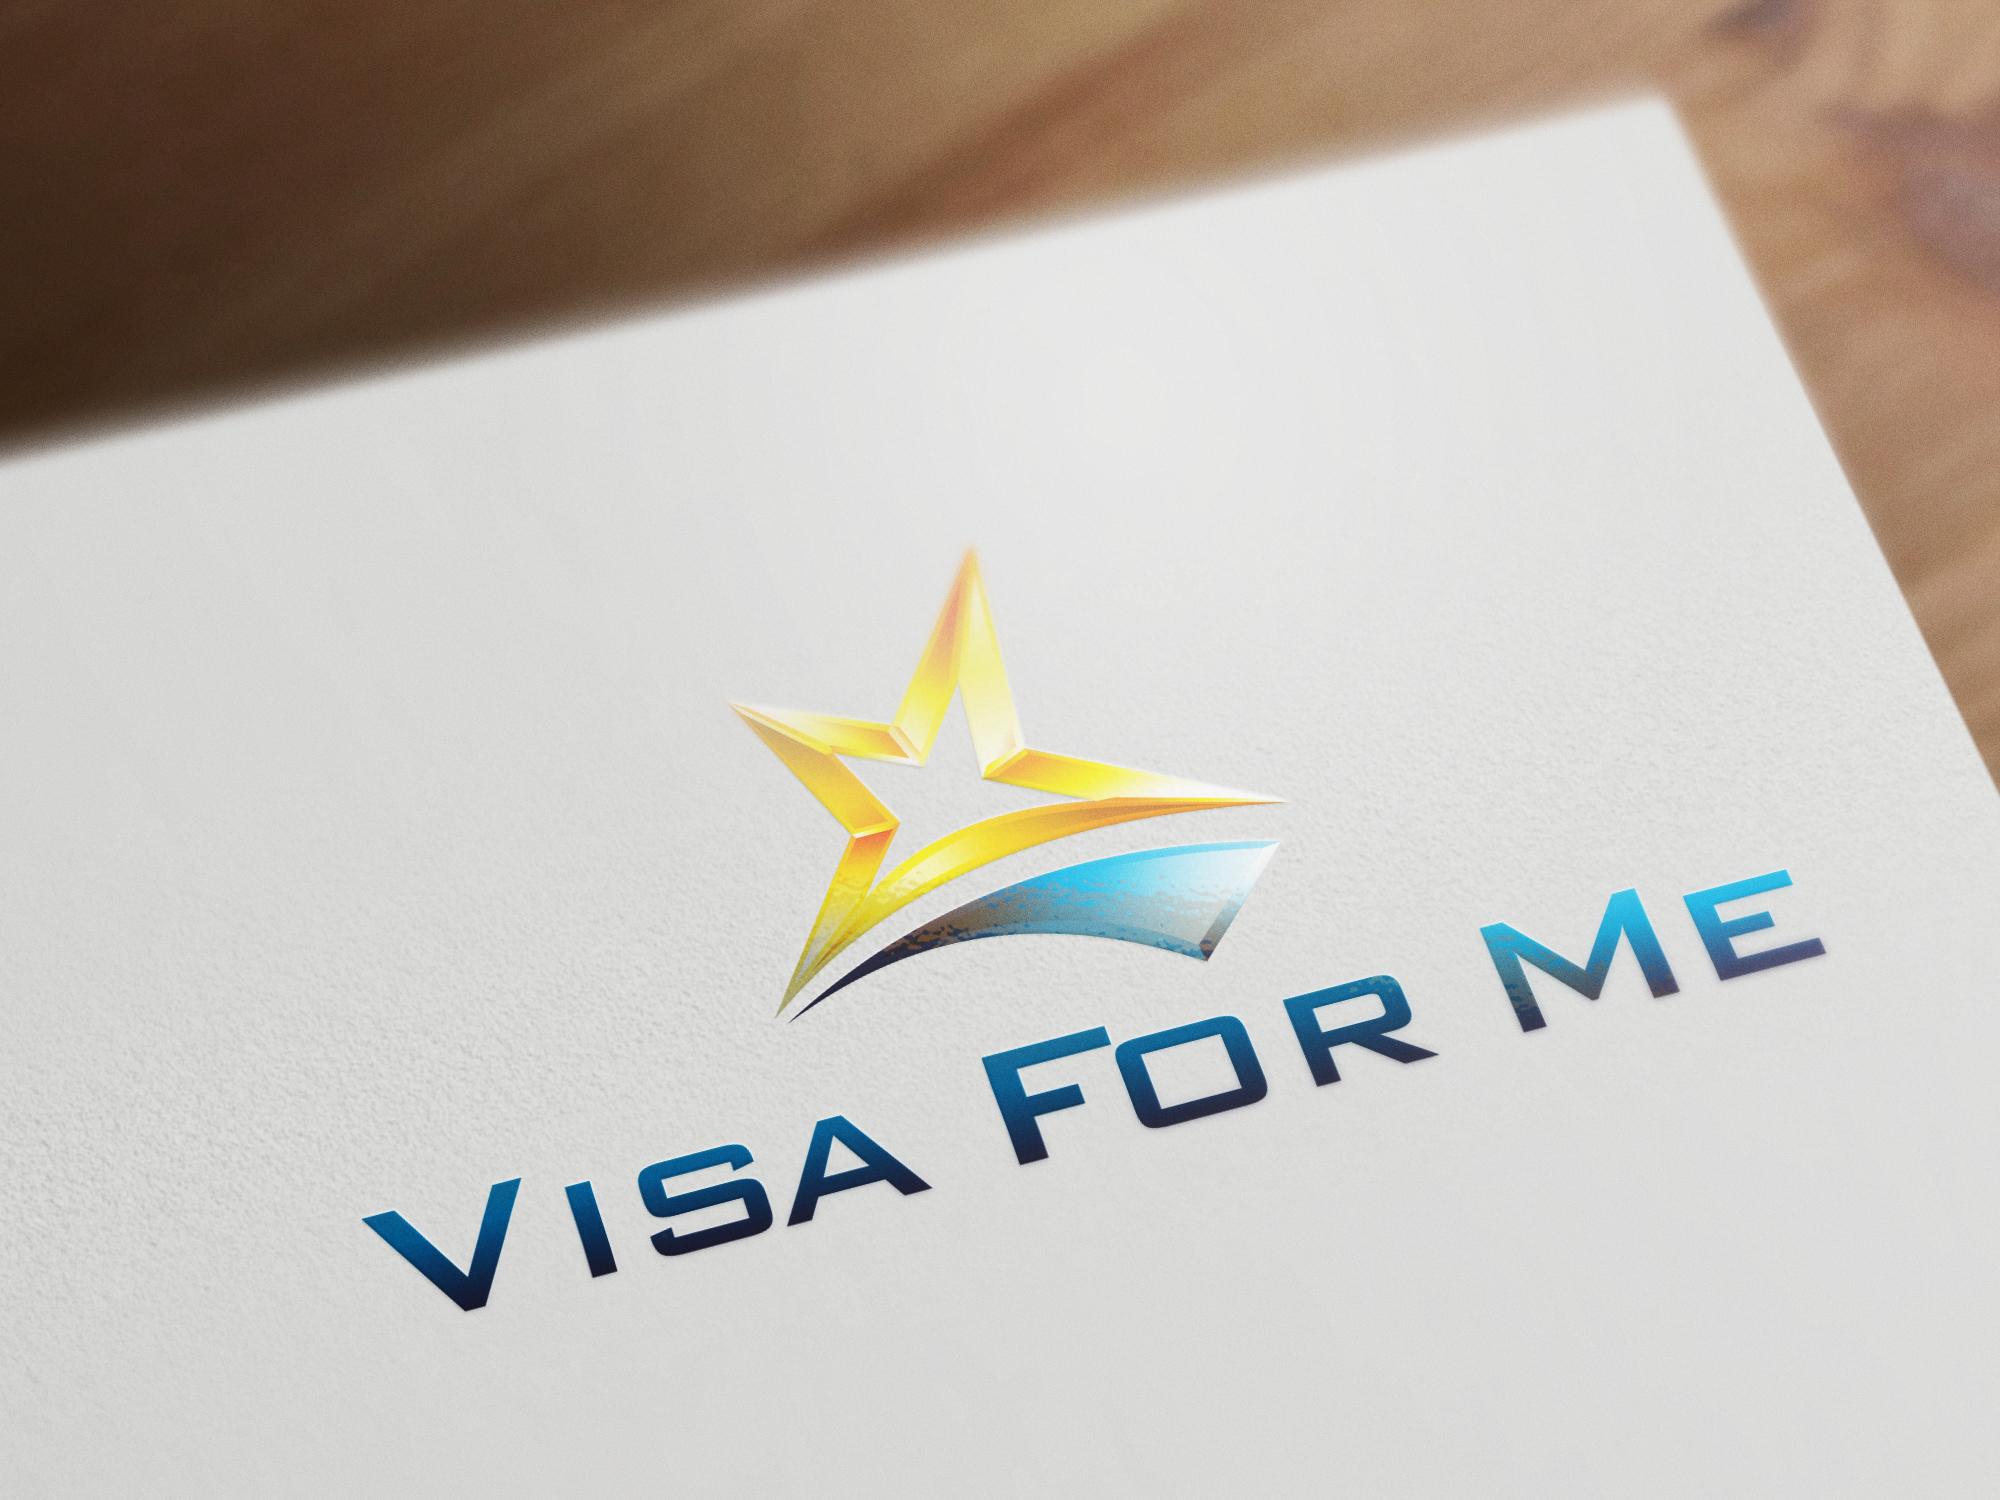 Visa For Me